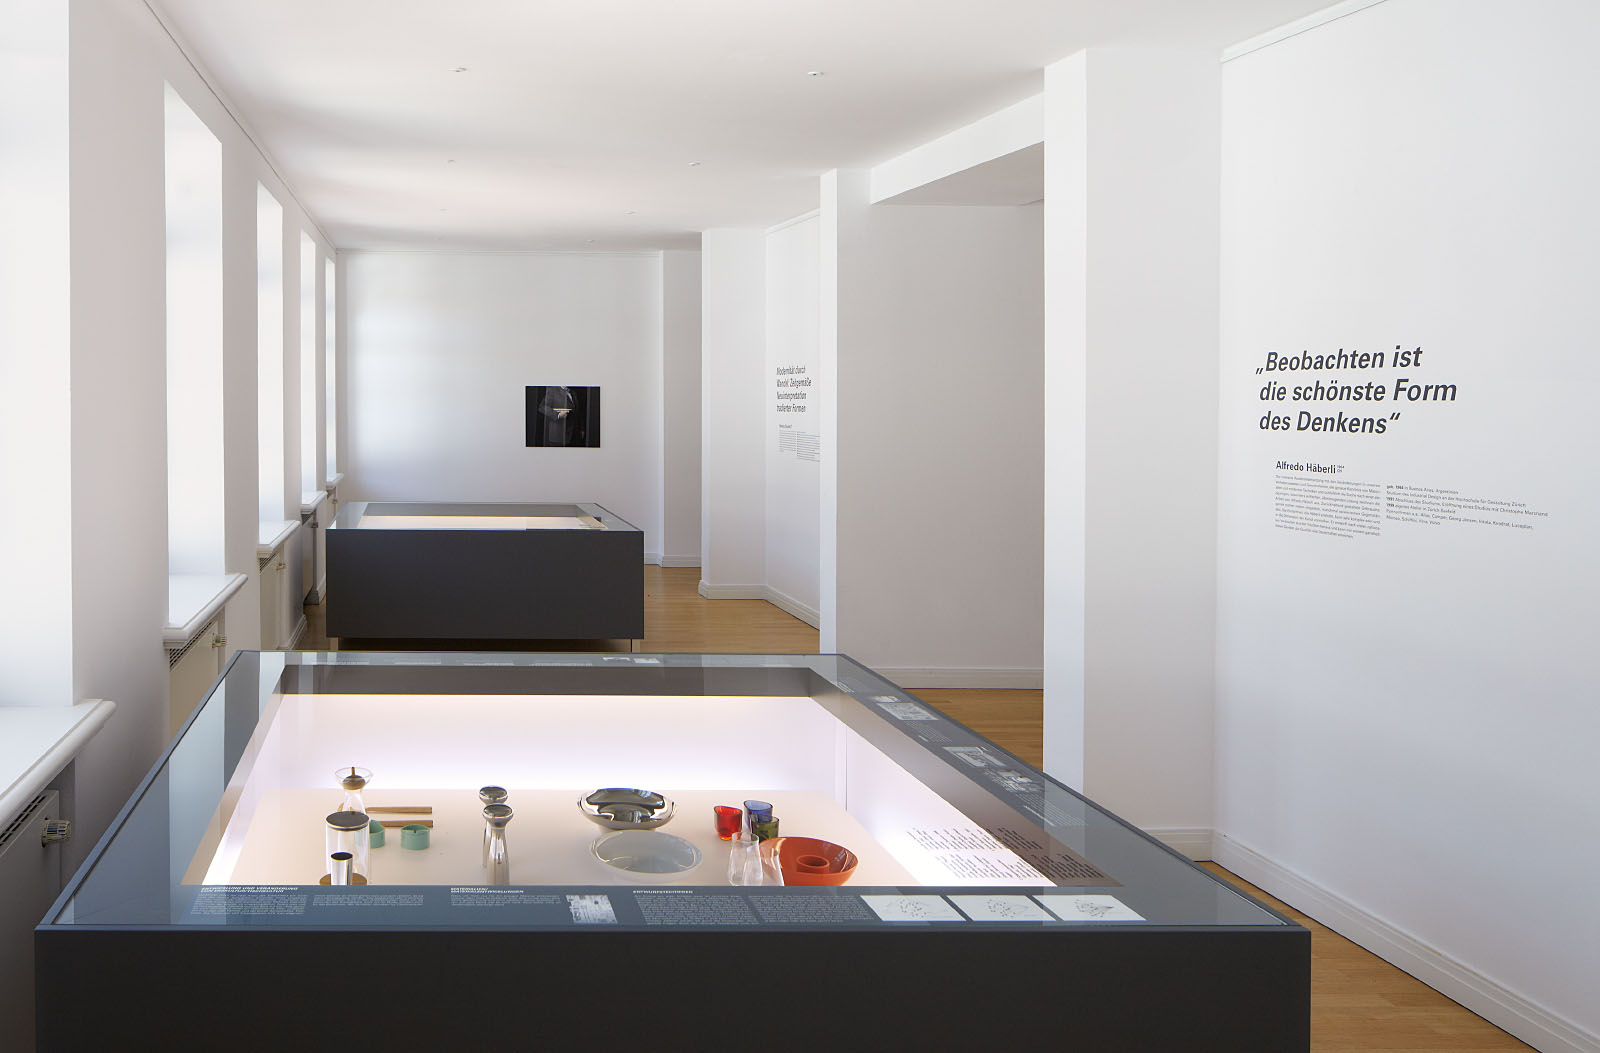 vsdd wilhelm wagenfeld stiftung bremen jens gerber. Black Bedroom Furniture Sets. Home Design Ideas